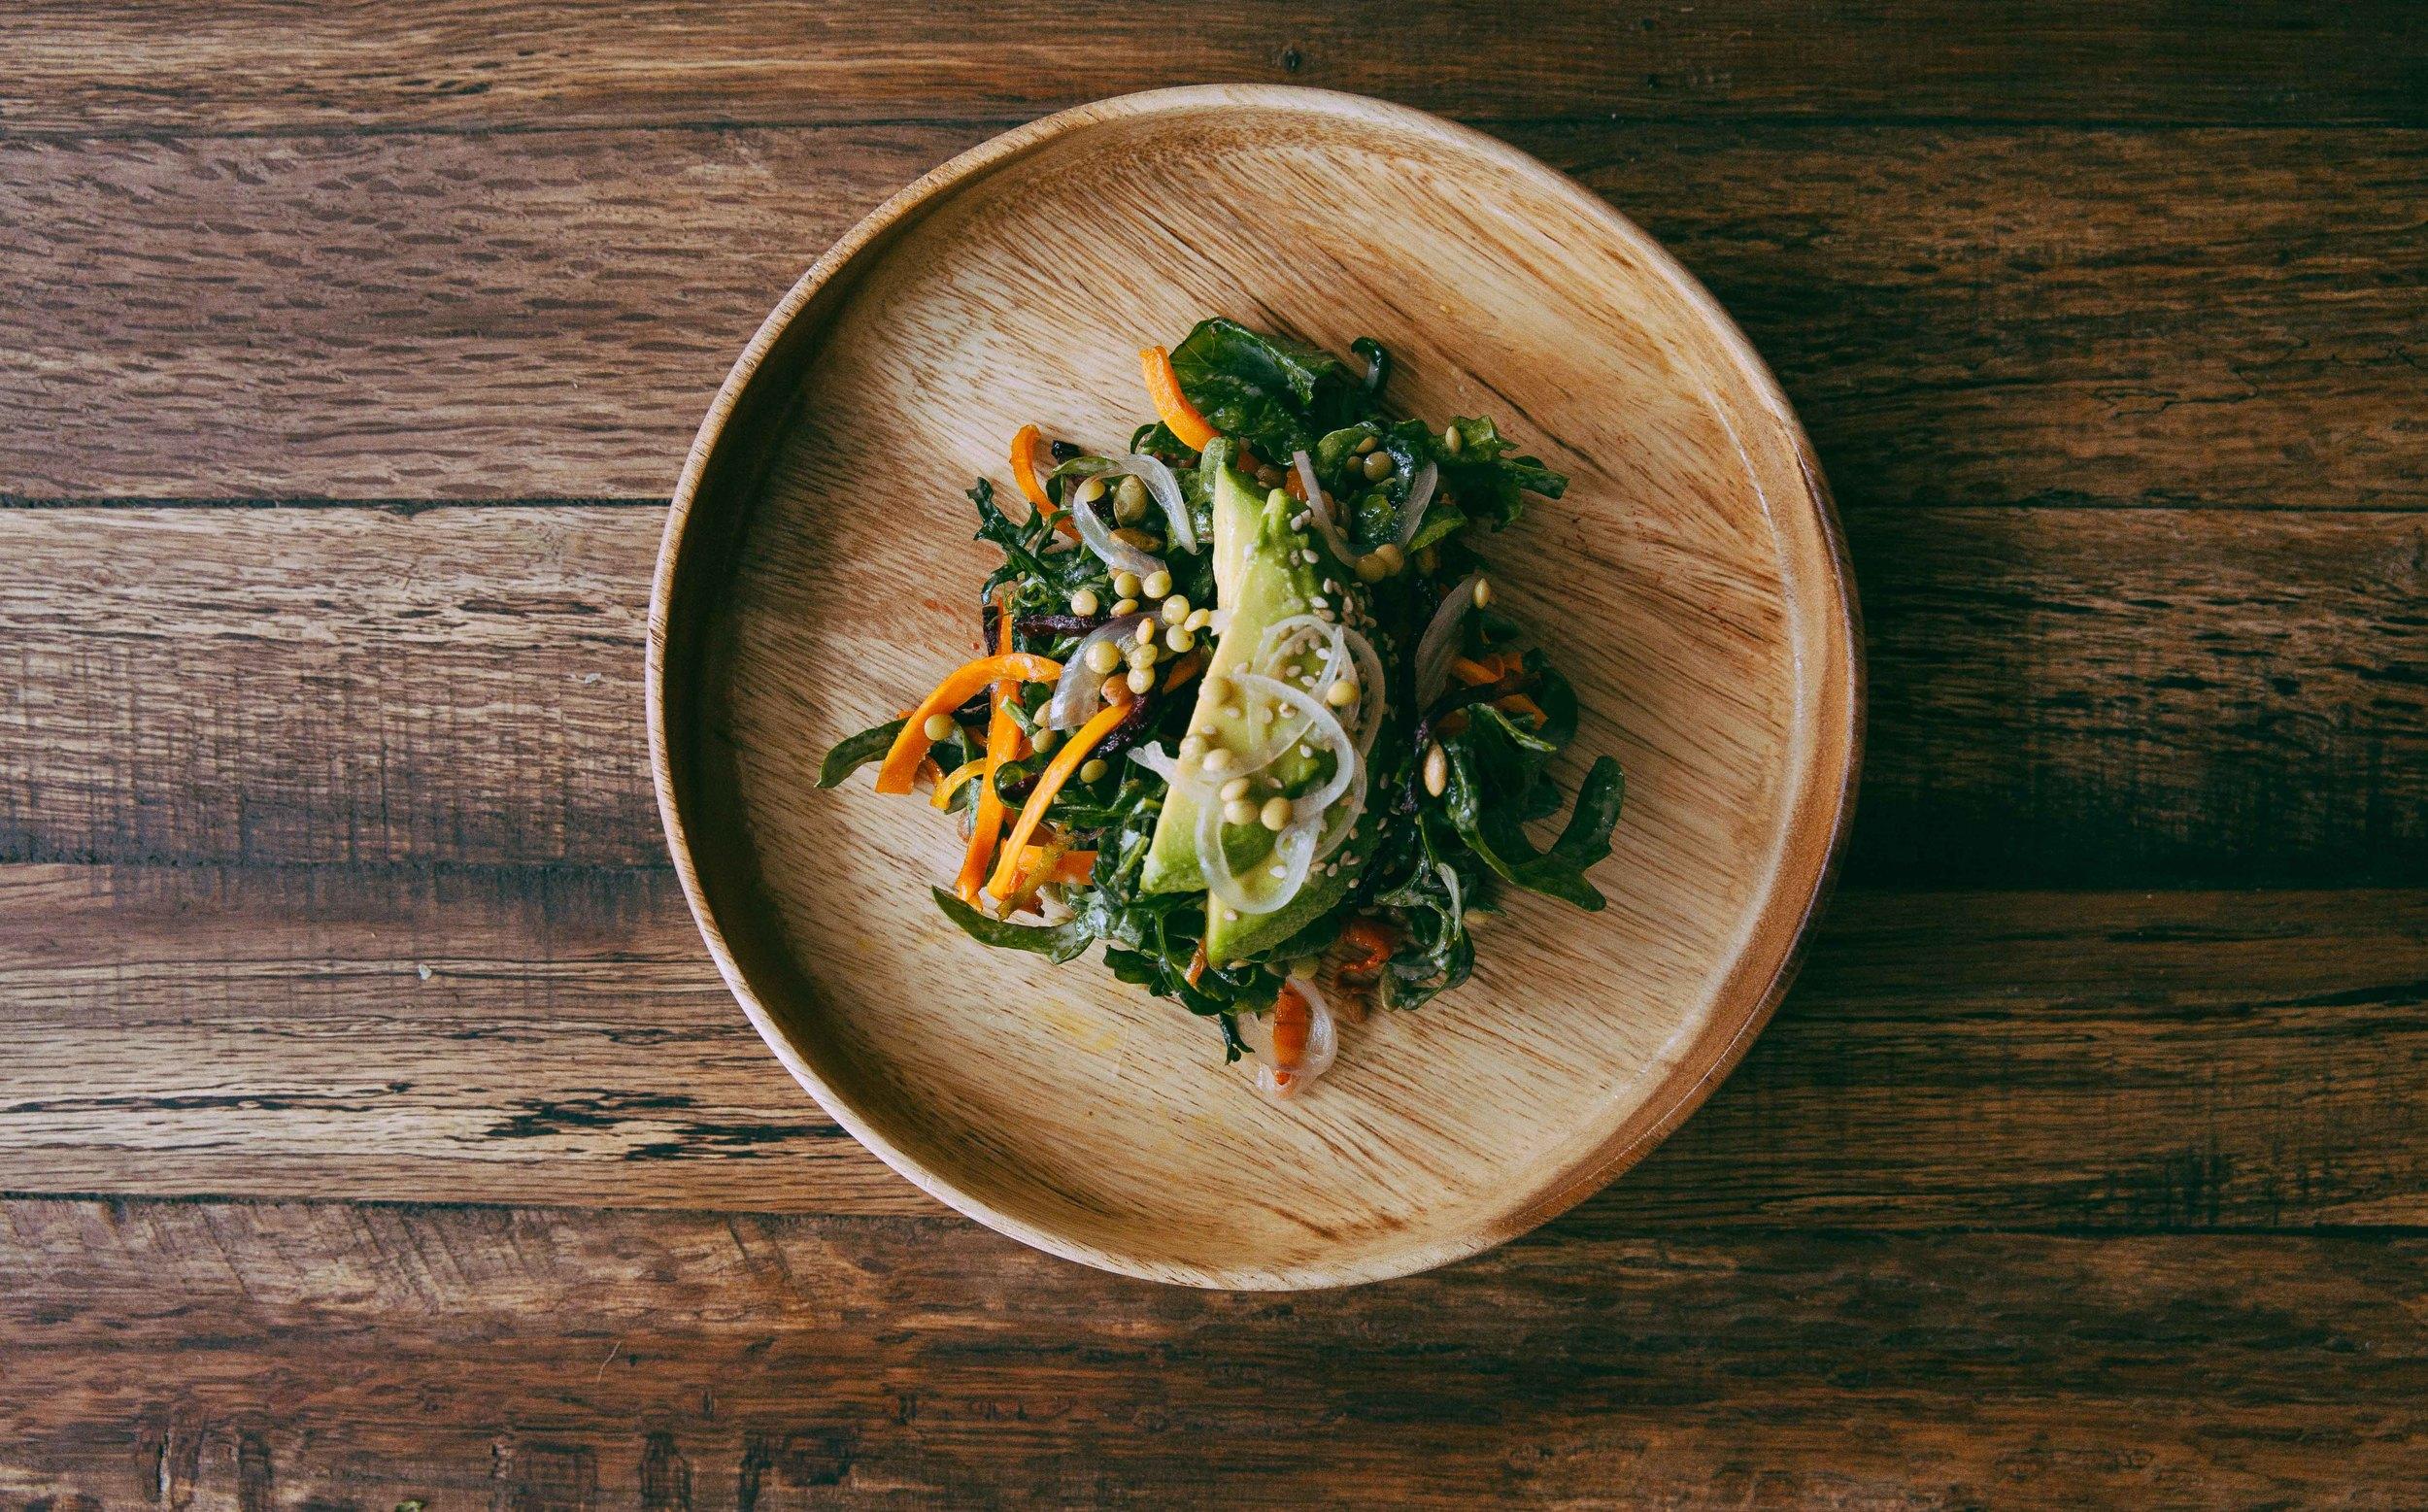 personal, chef, healthy, nutritious, meals, lentil salad 6